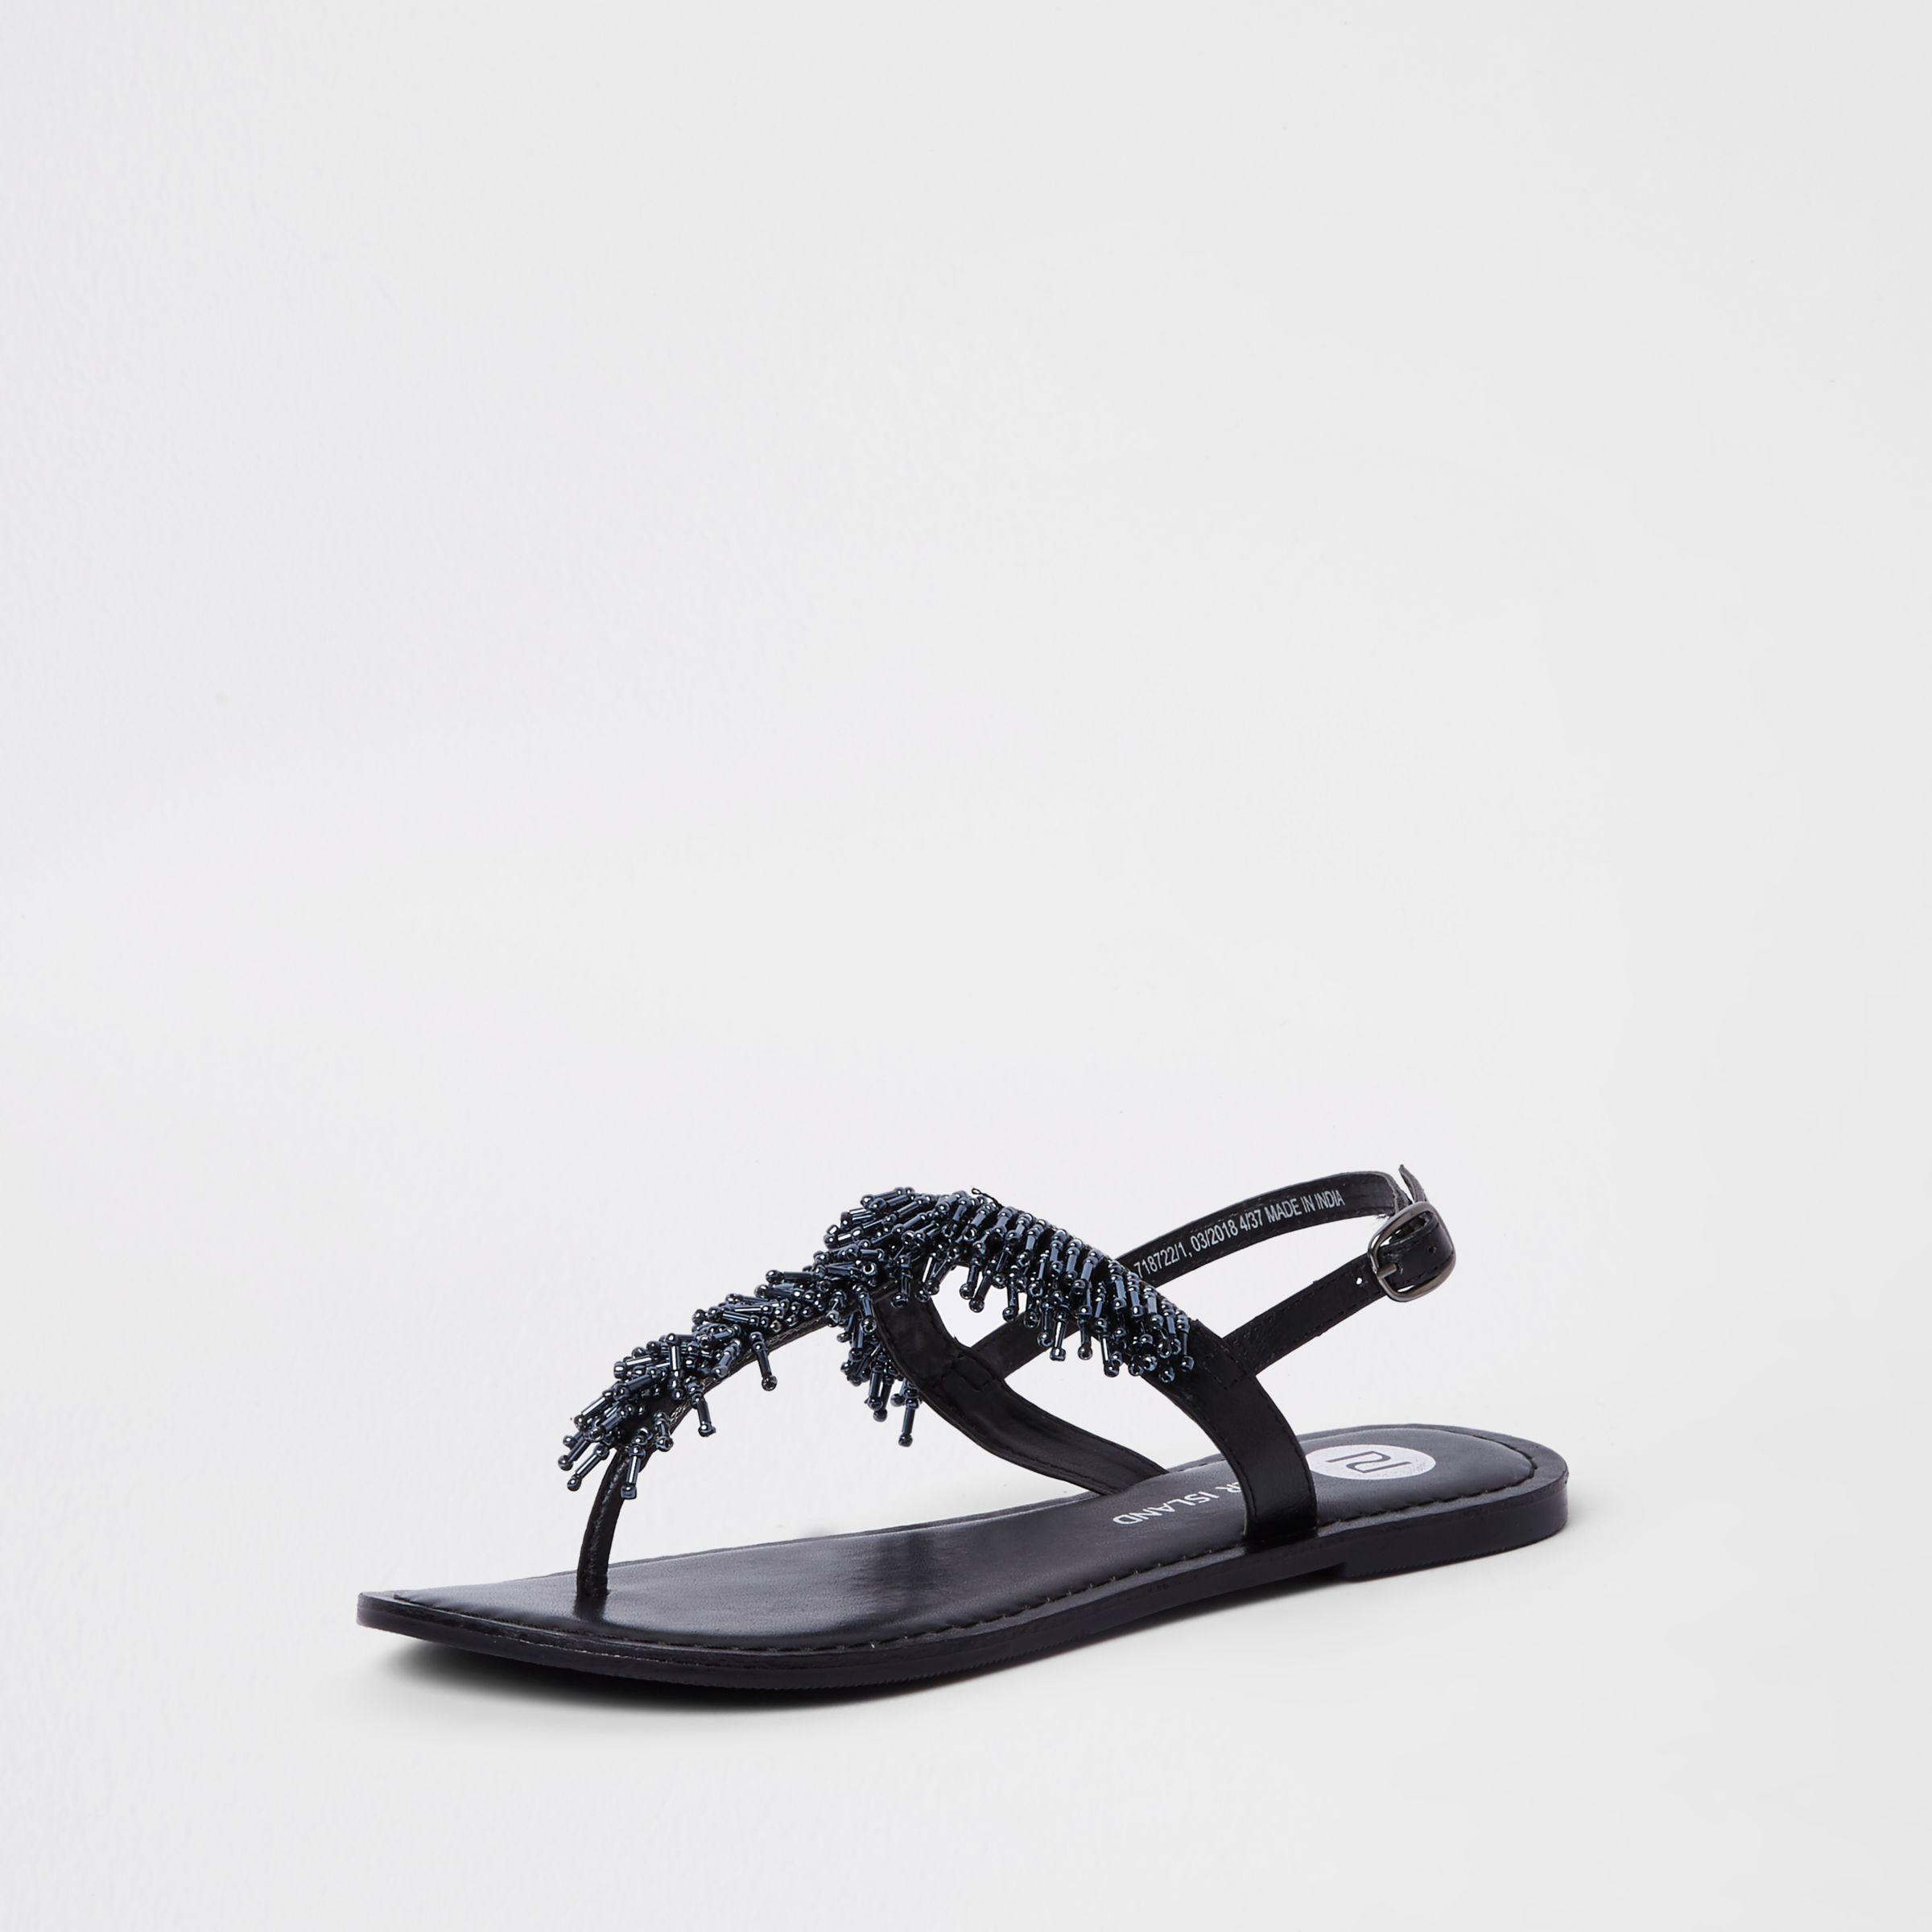 c4faf27289dd00 Lyst - River Island Black Bead Embroidered Sandals in Black